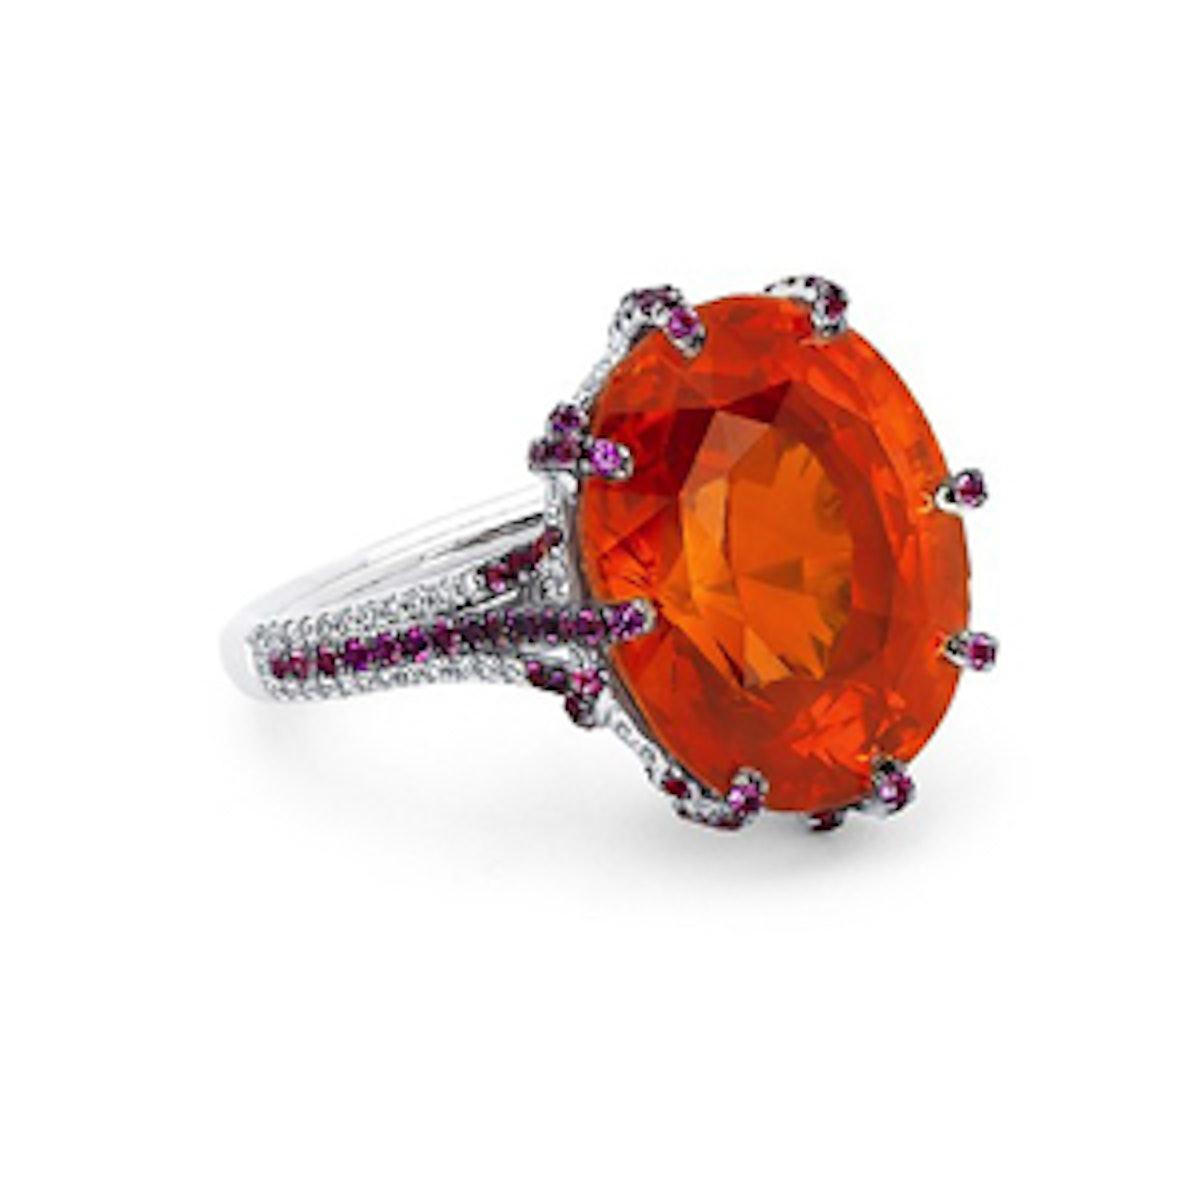 15.5 Carat Cushion-Cut Orange Sapphire Ring